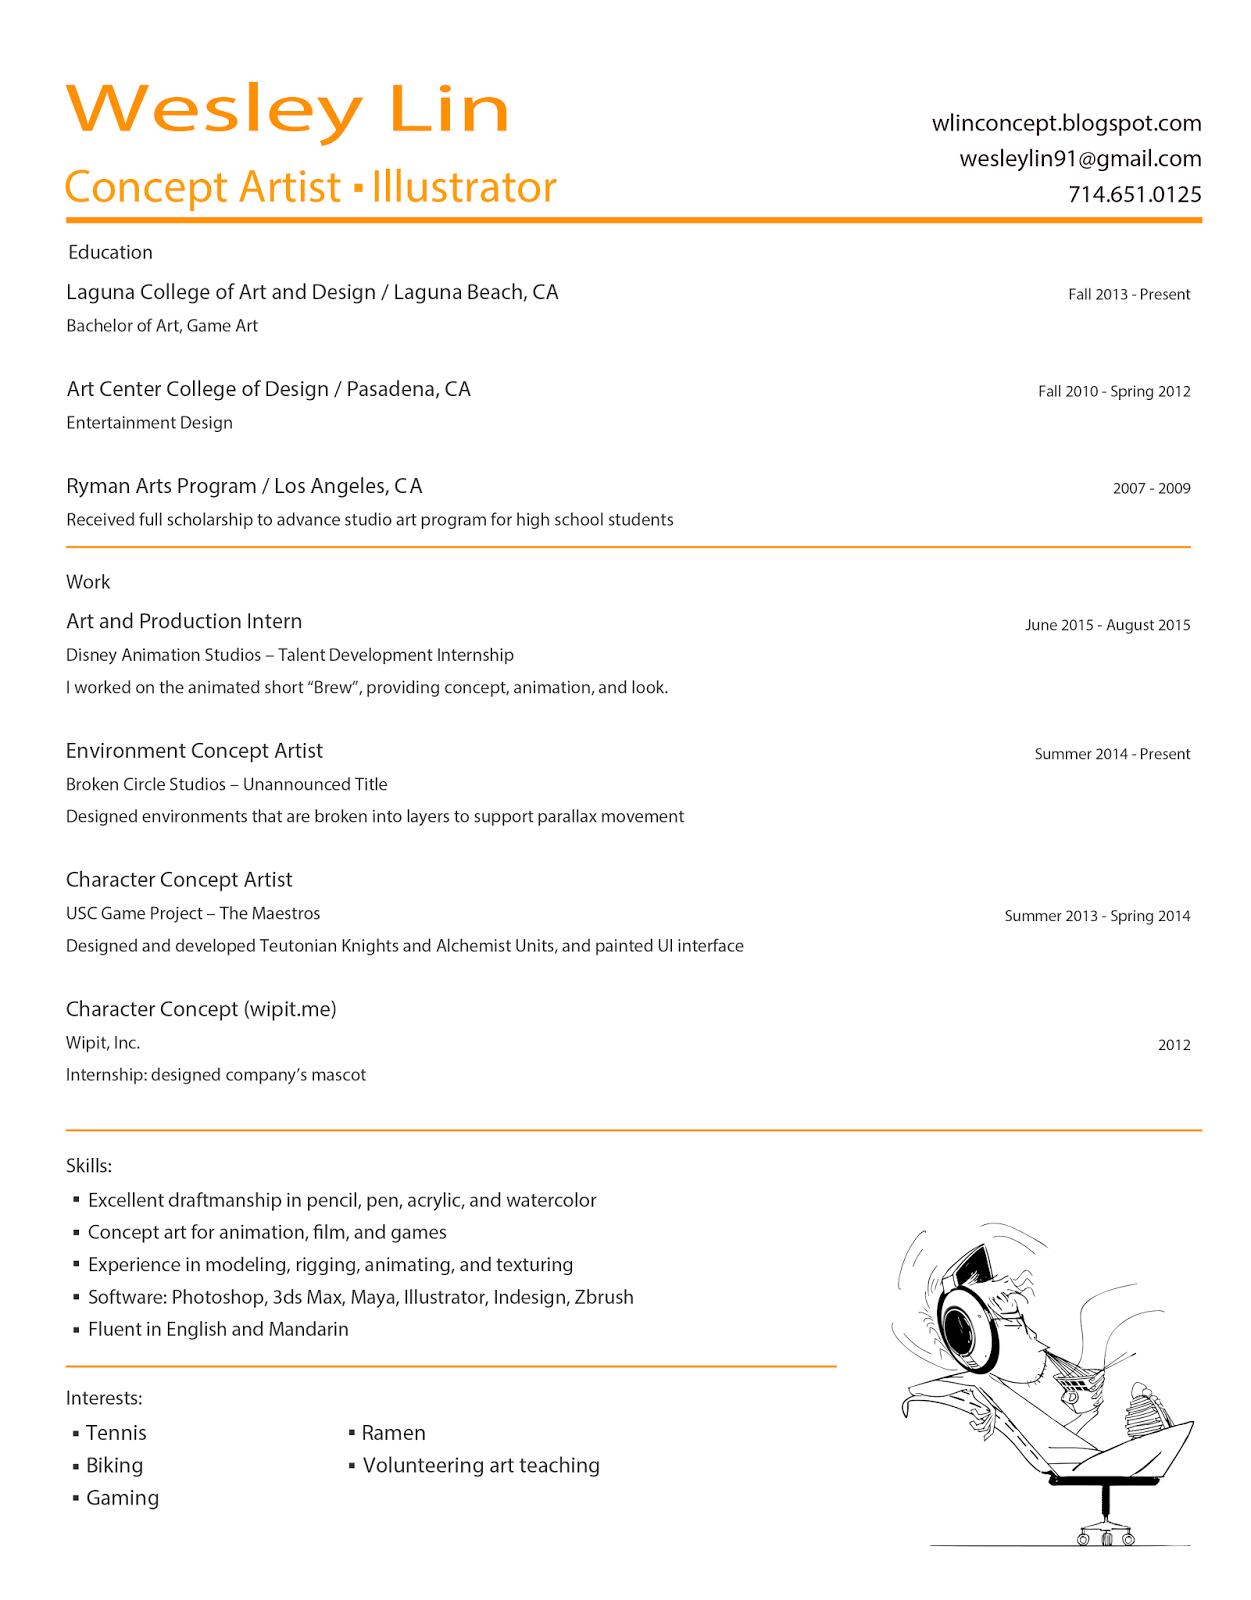 Wesley Lin Design: Contact / Resume